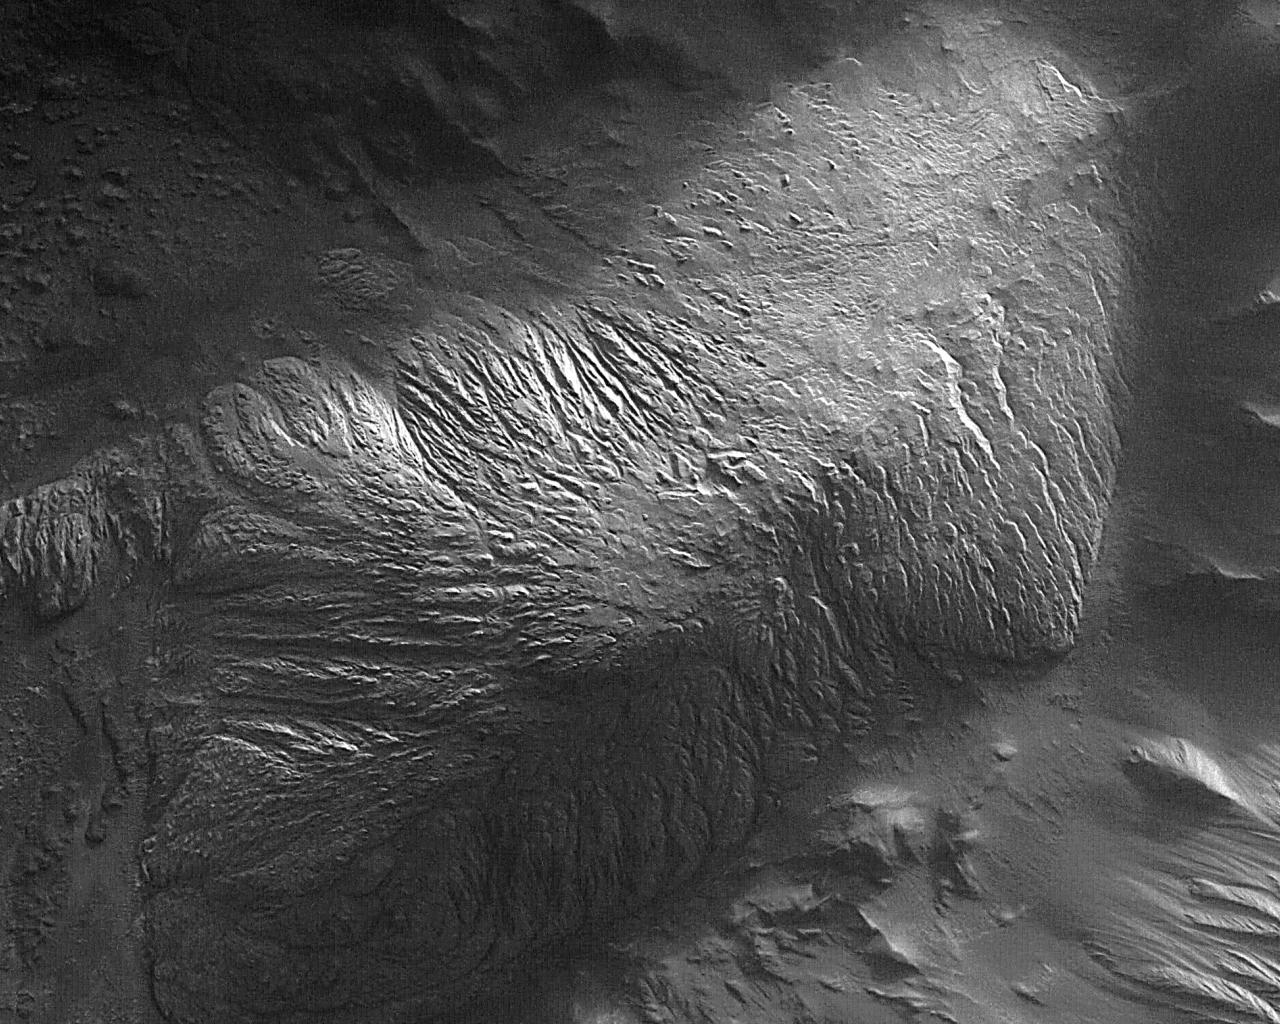 1567218095996-TithoniumChasma-hill-wallpaper.jpg